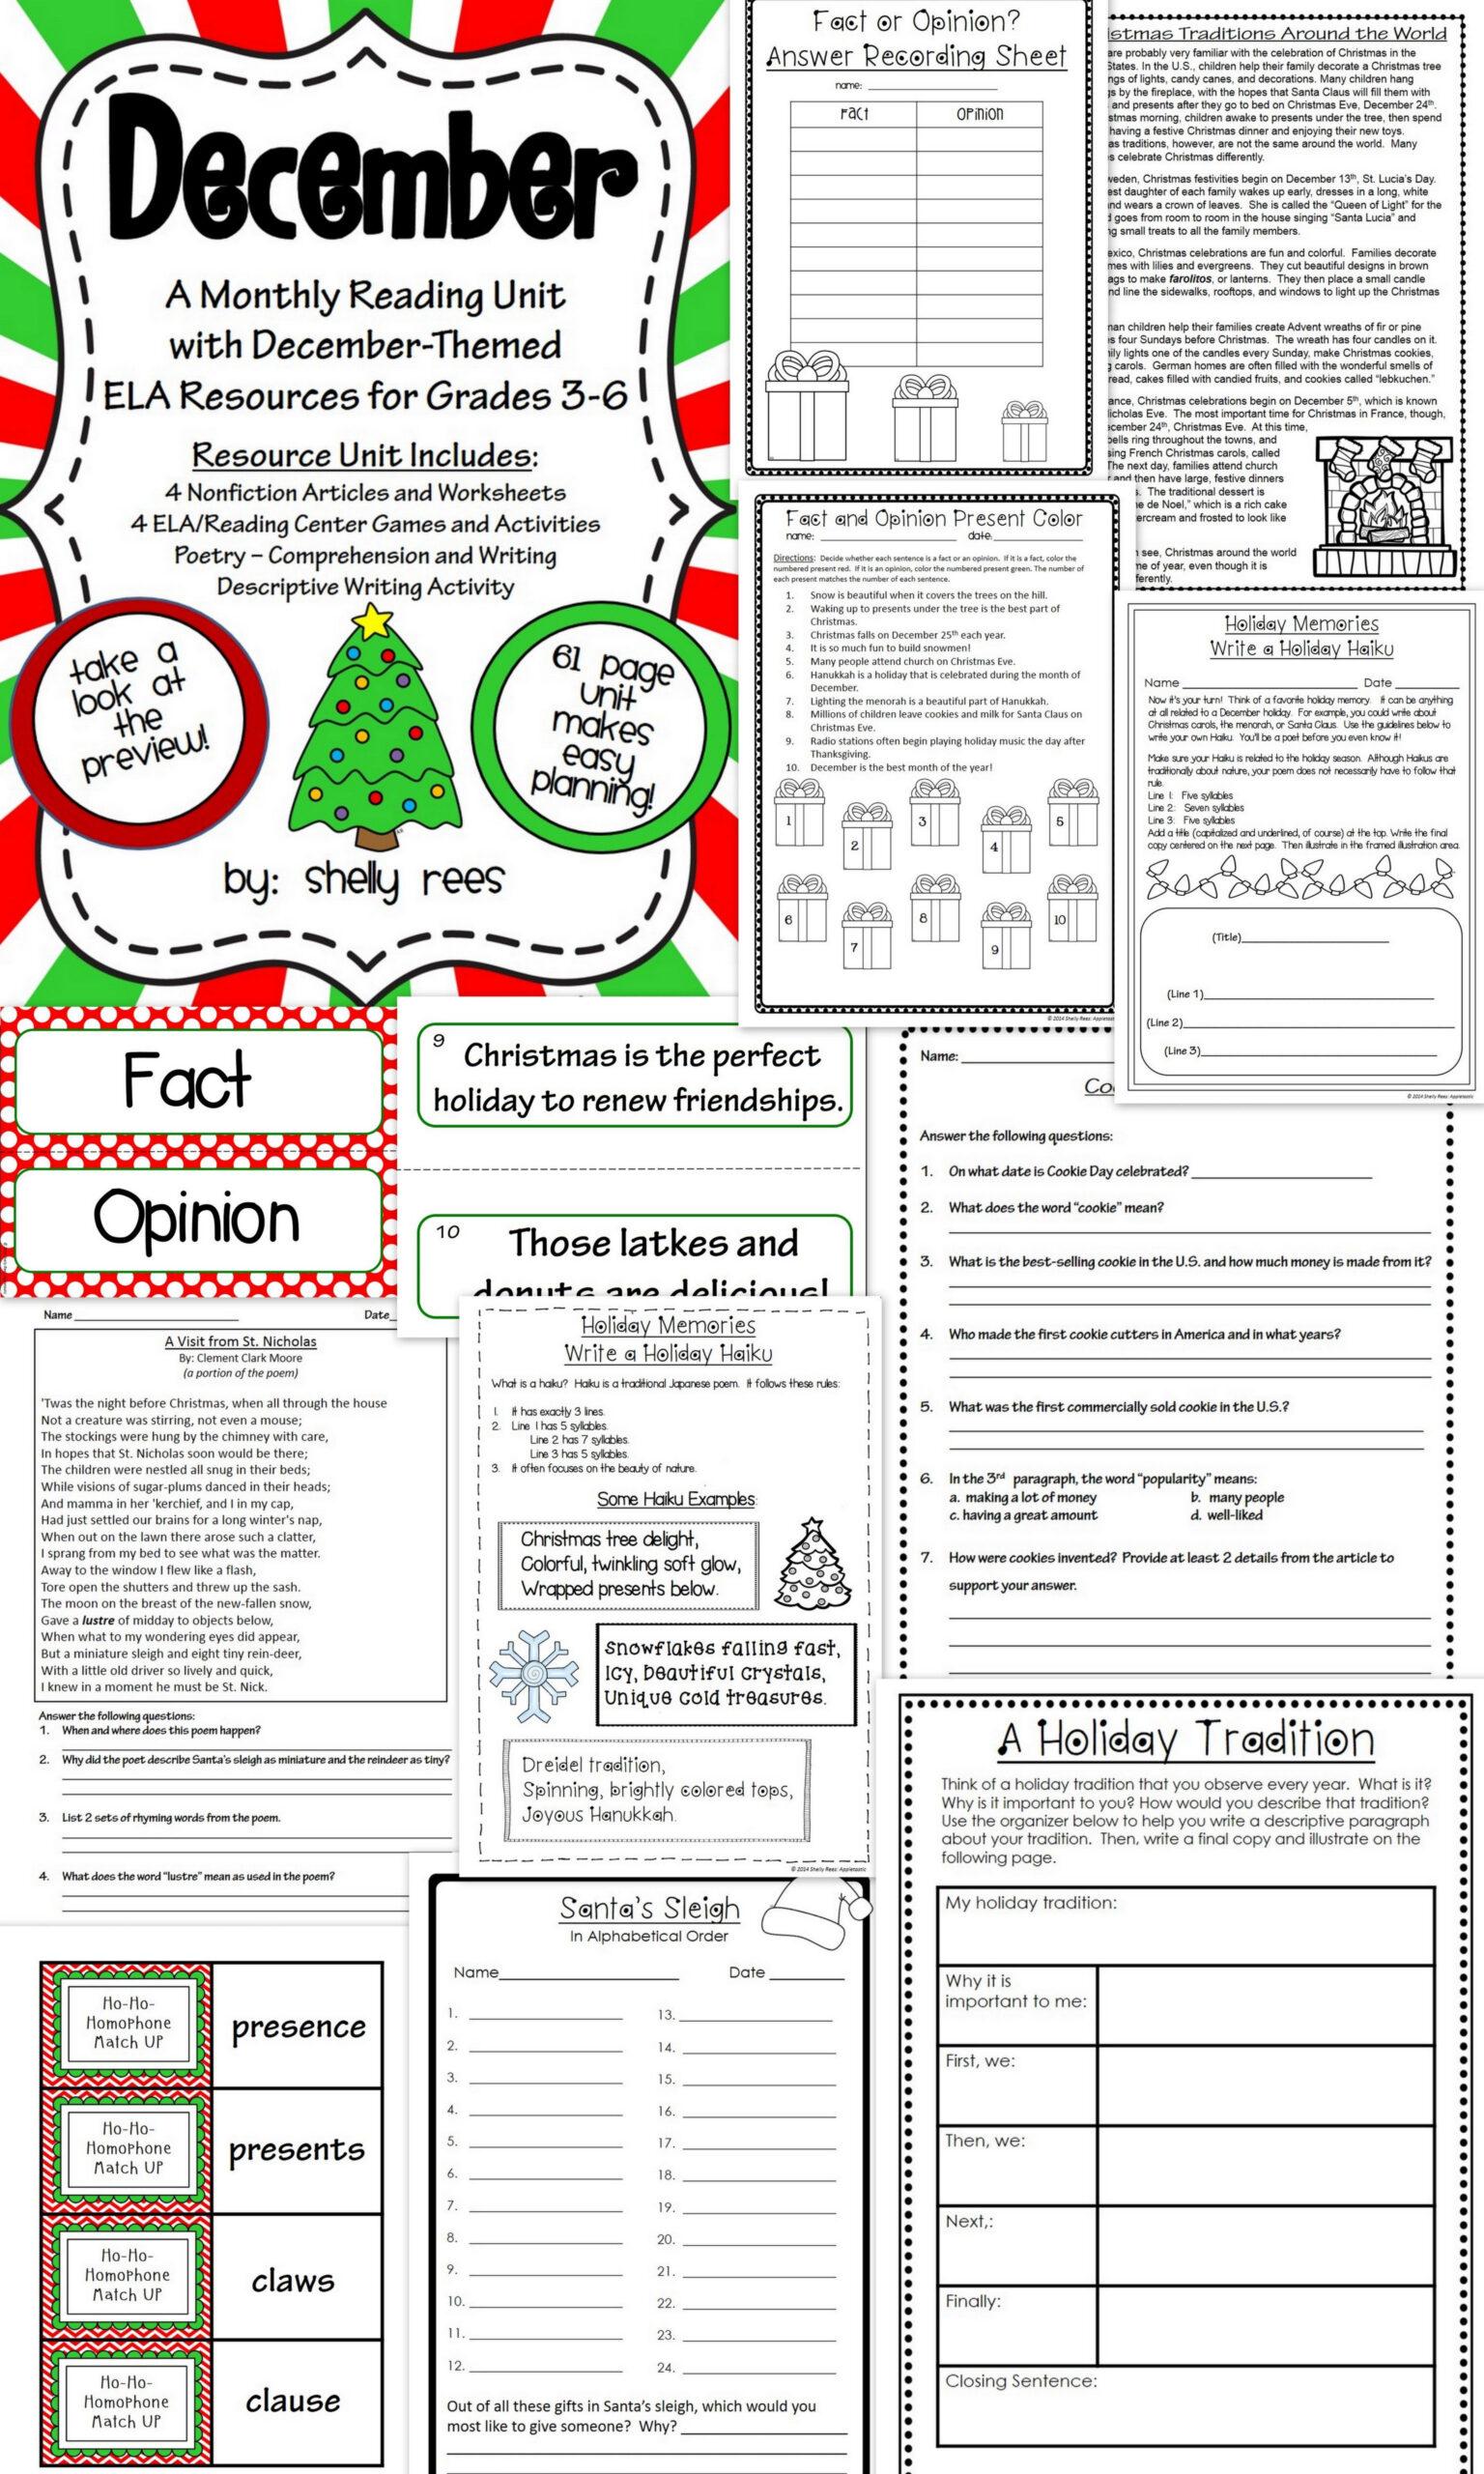 December Reading/ela Resource Packet - Grades 4, 5, And 6